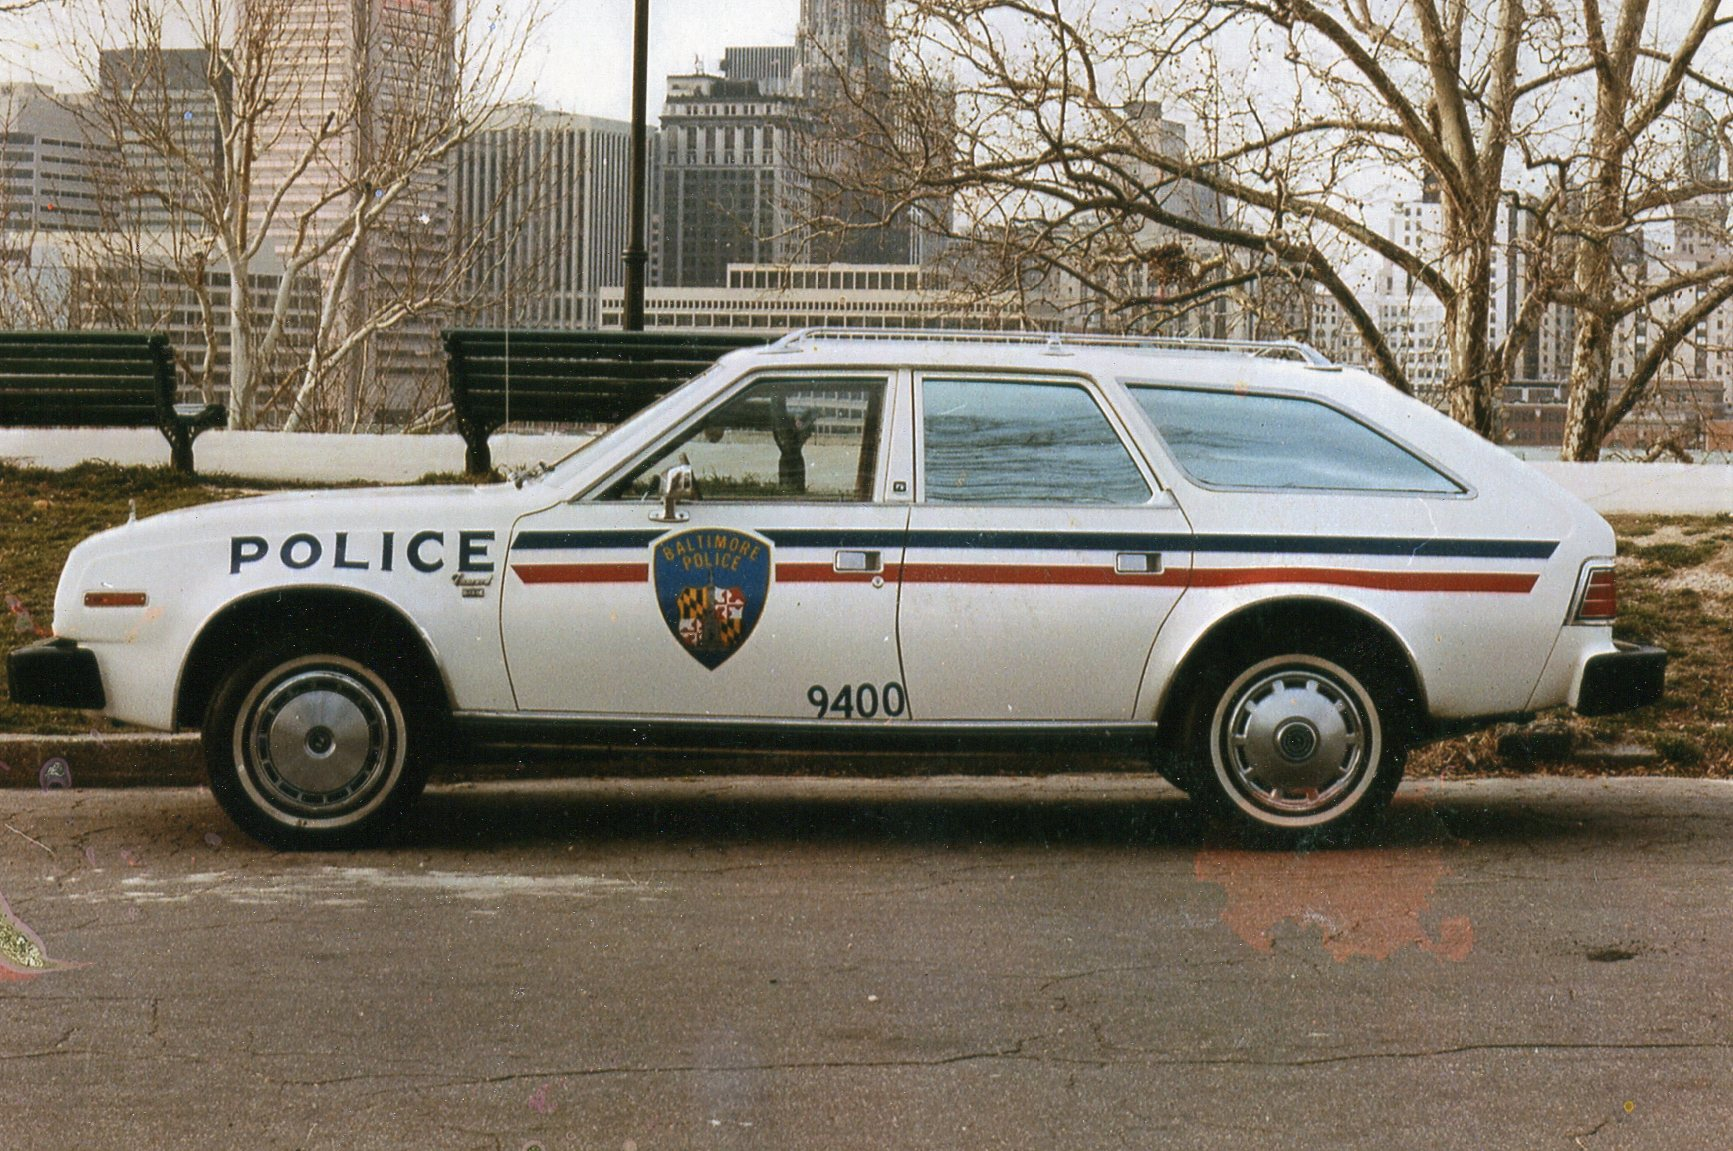 Amc Police Concord Baltimore Jpg 486314 Bytes